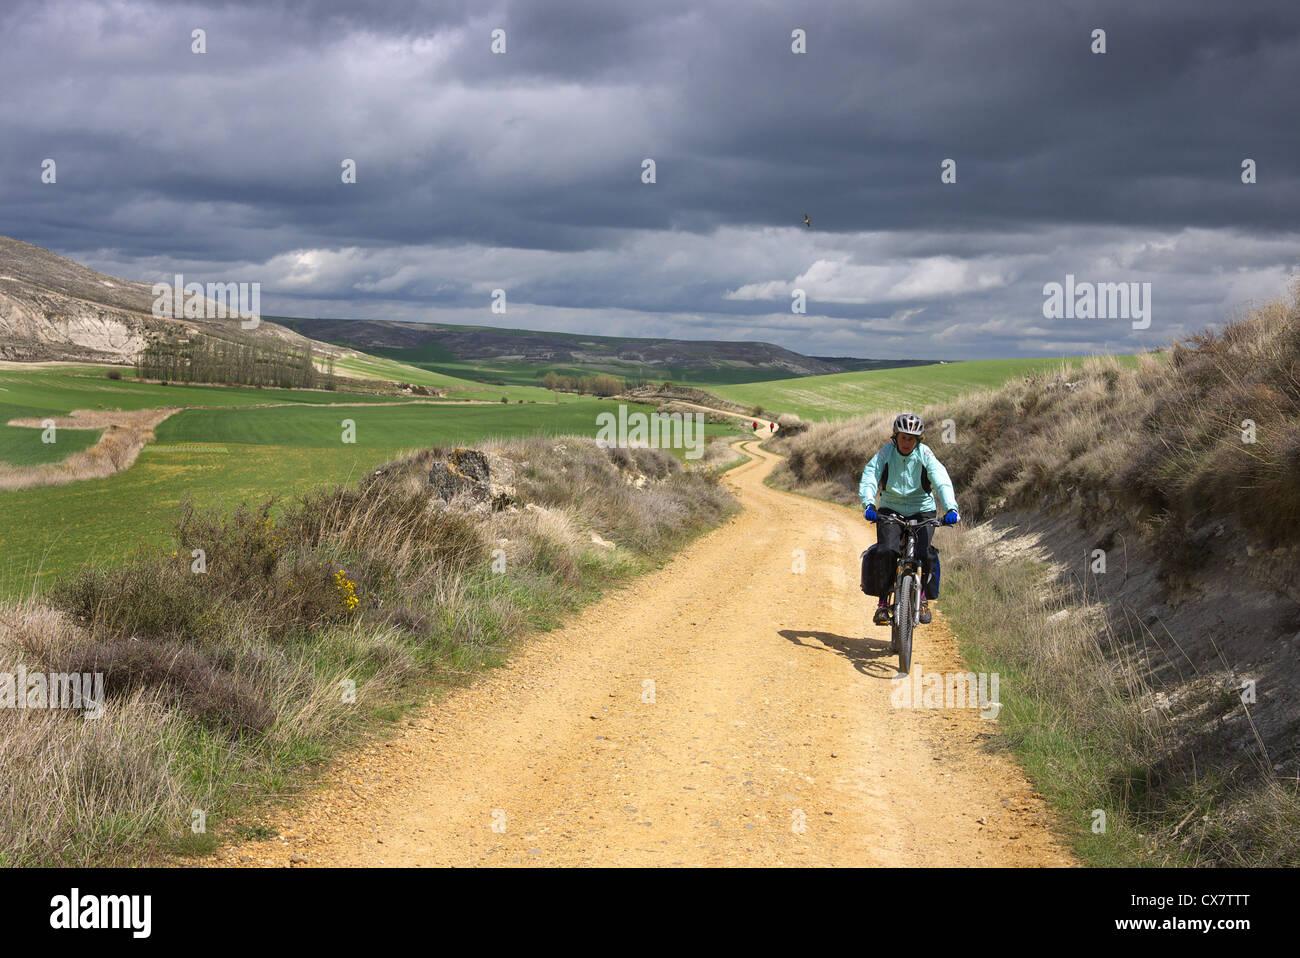 A pilgrim cycling the camino to Santiago in Castilla y Leon, Spain near Tardajos. - Stock Image